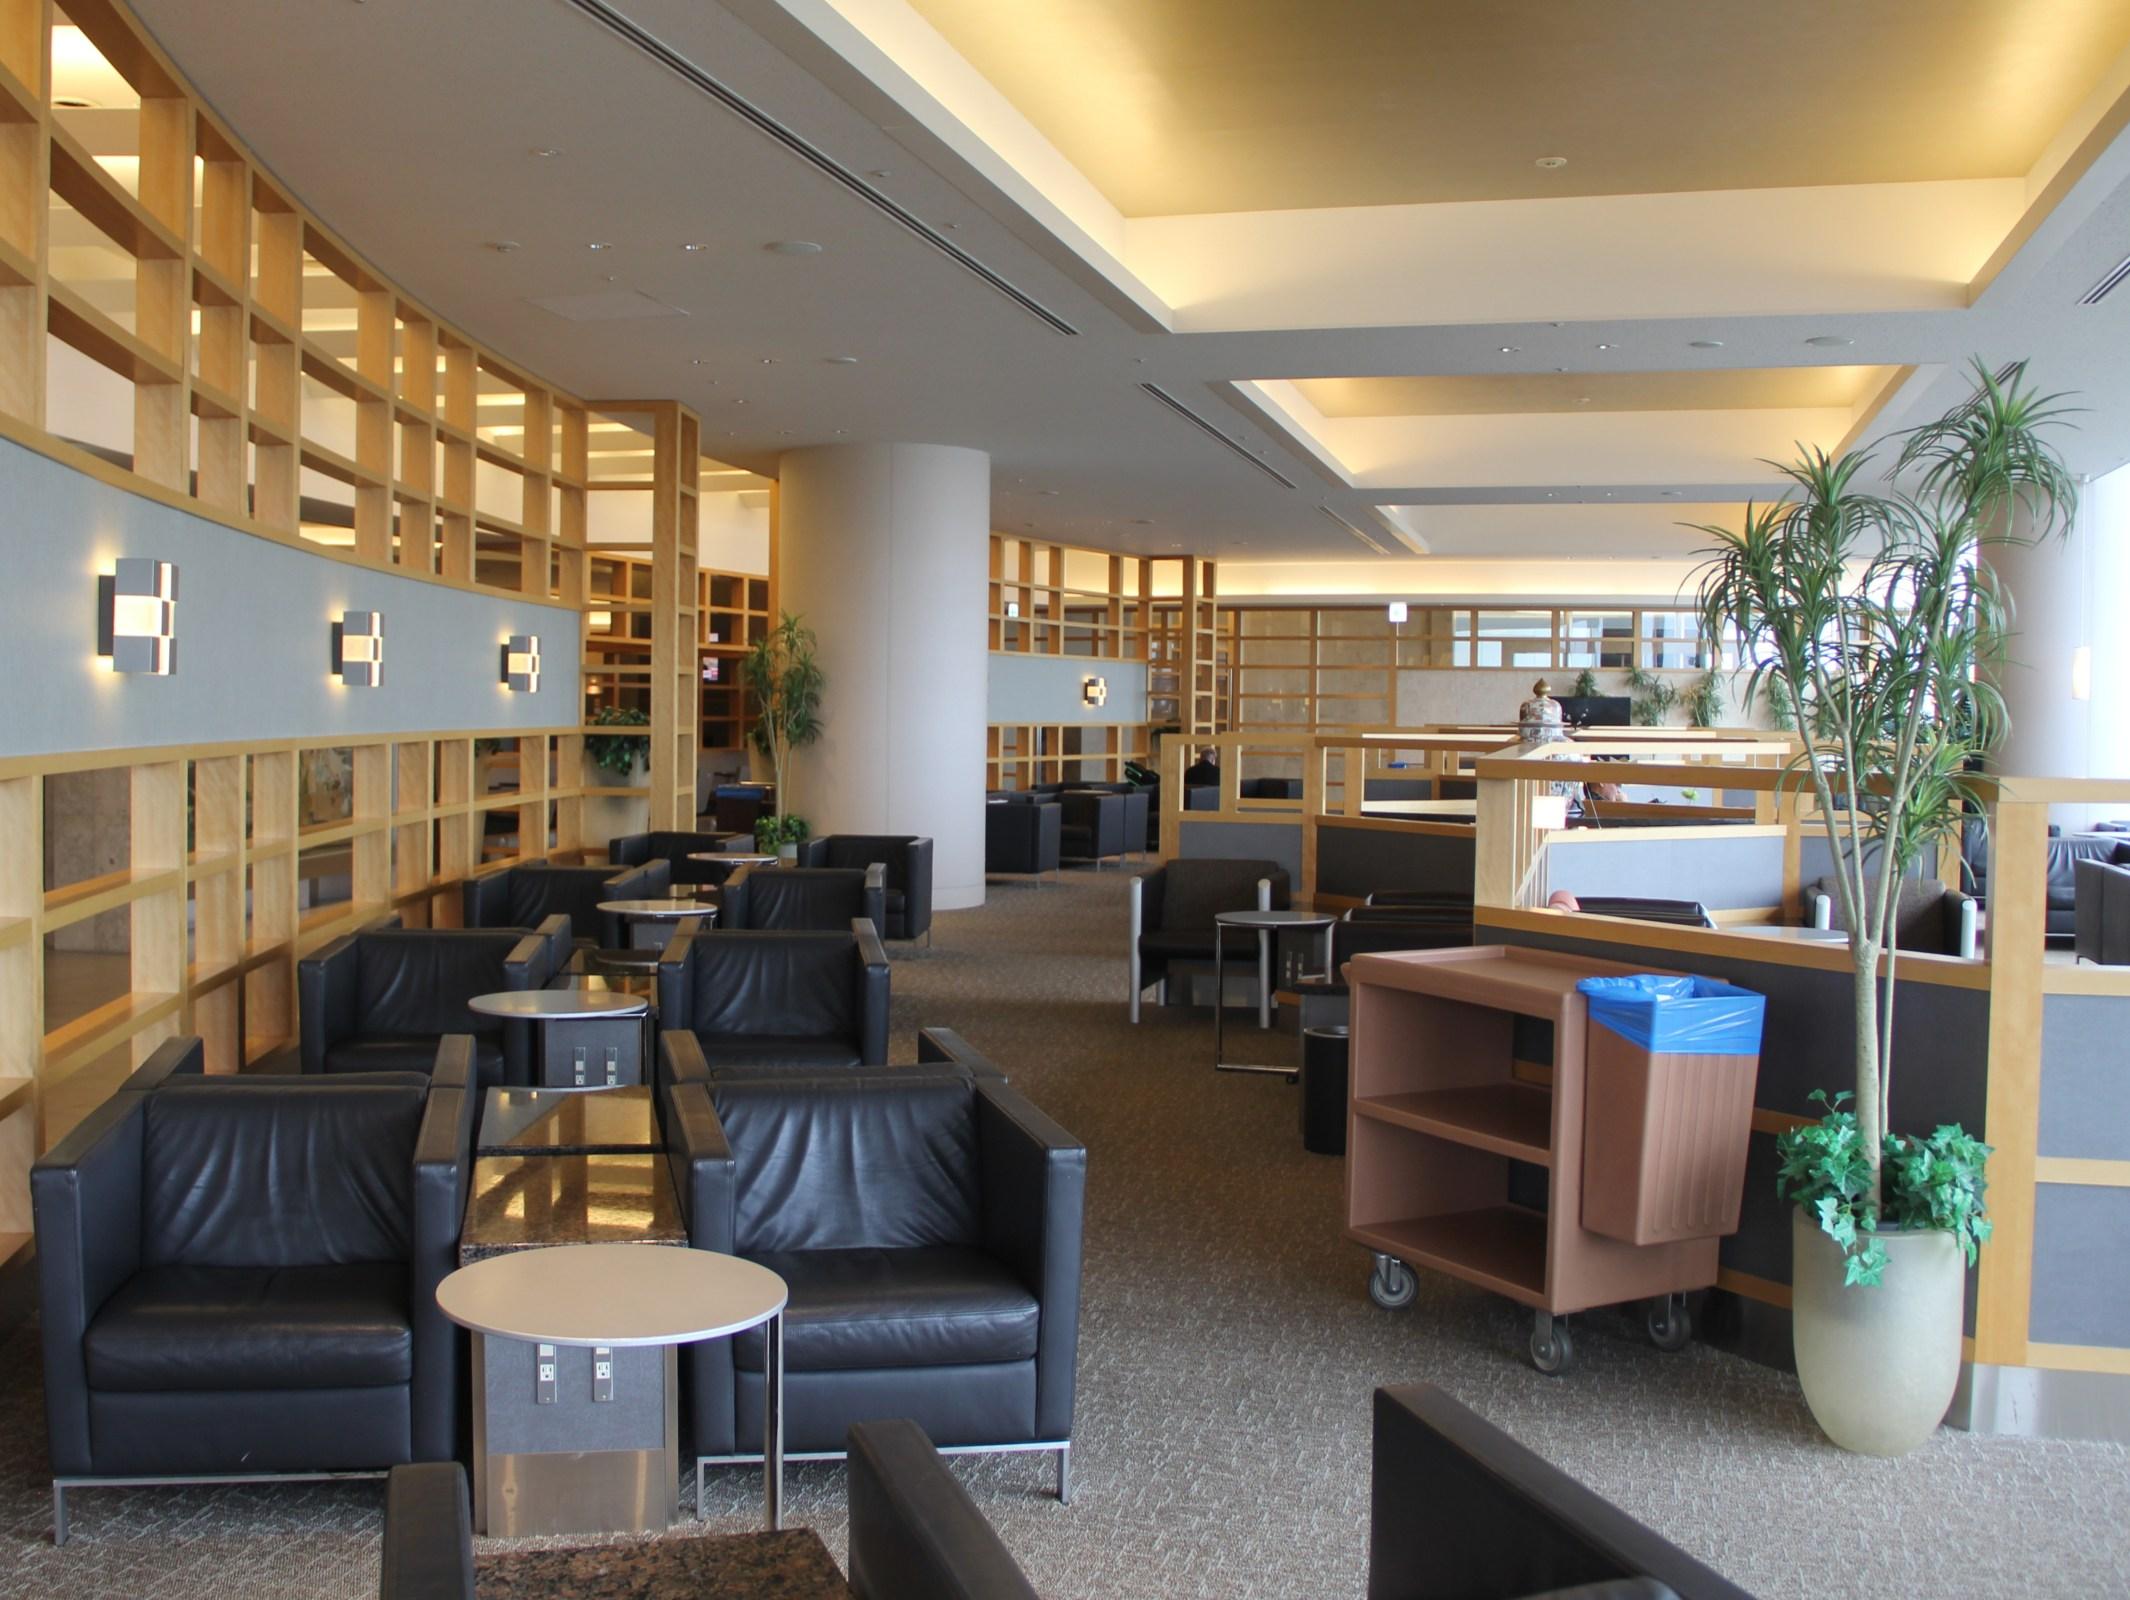 American Airlines Admirals Club Tokyo Narita Seating